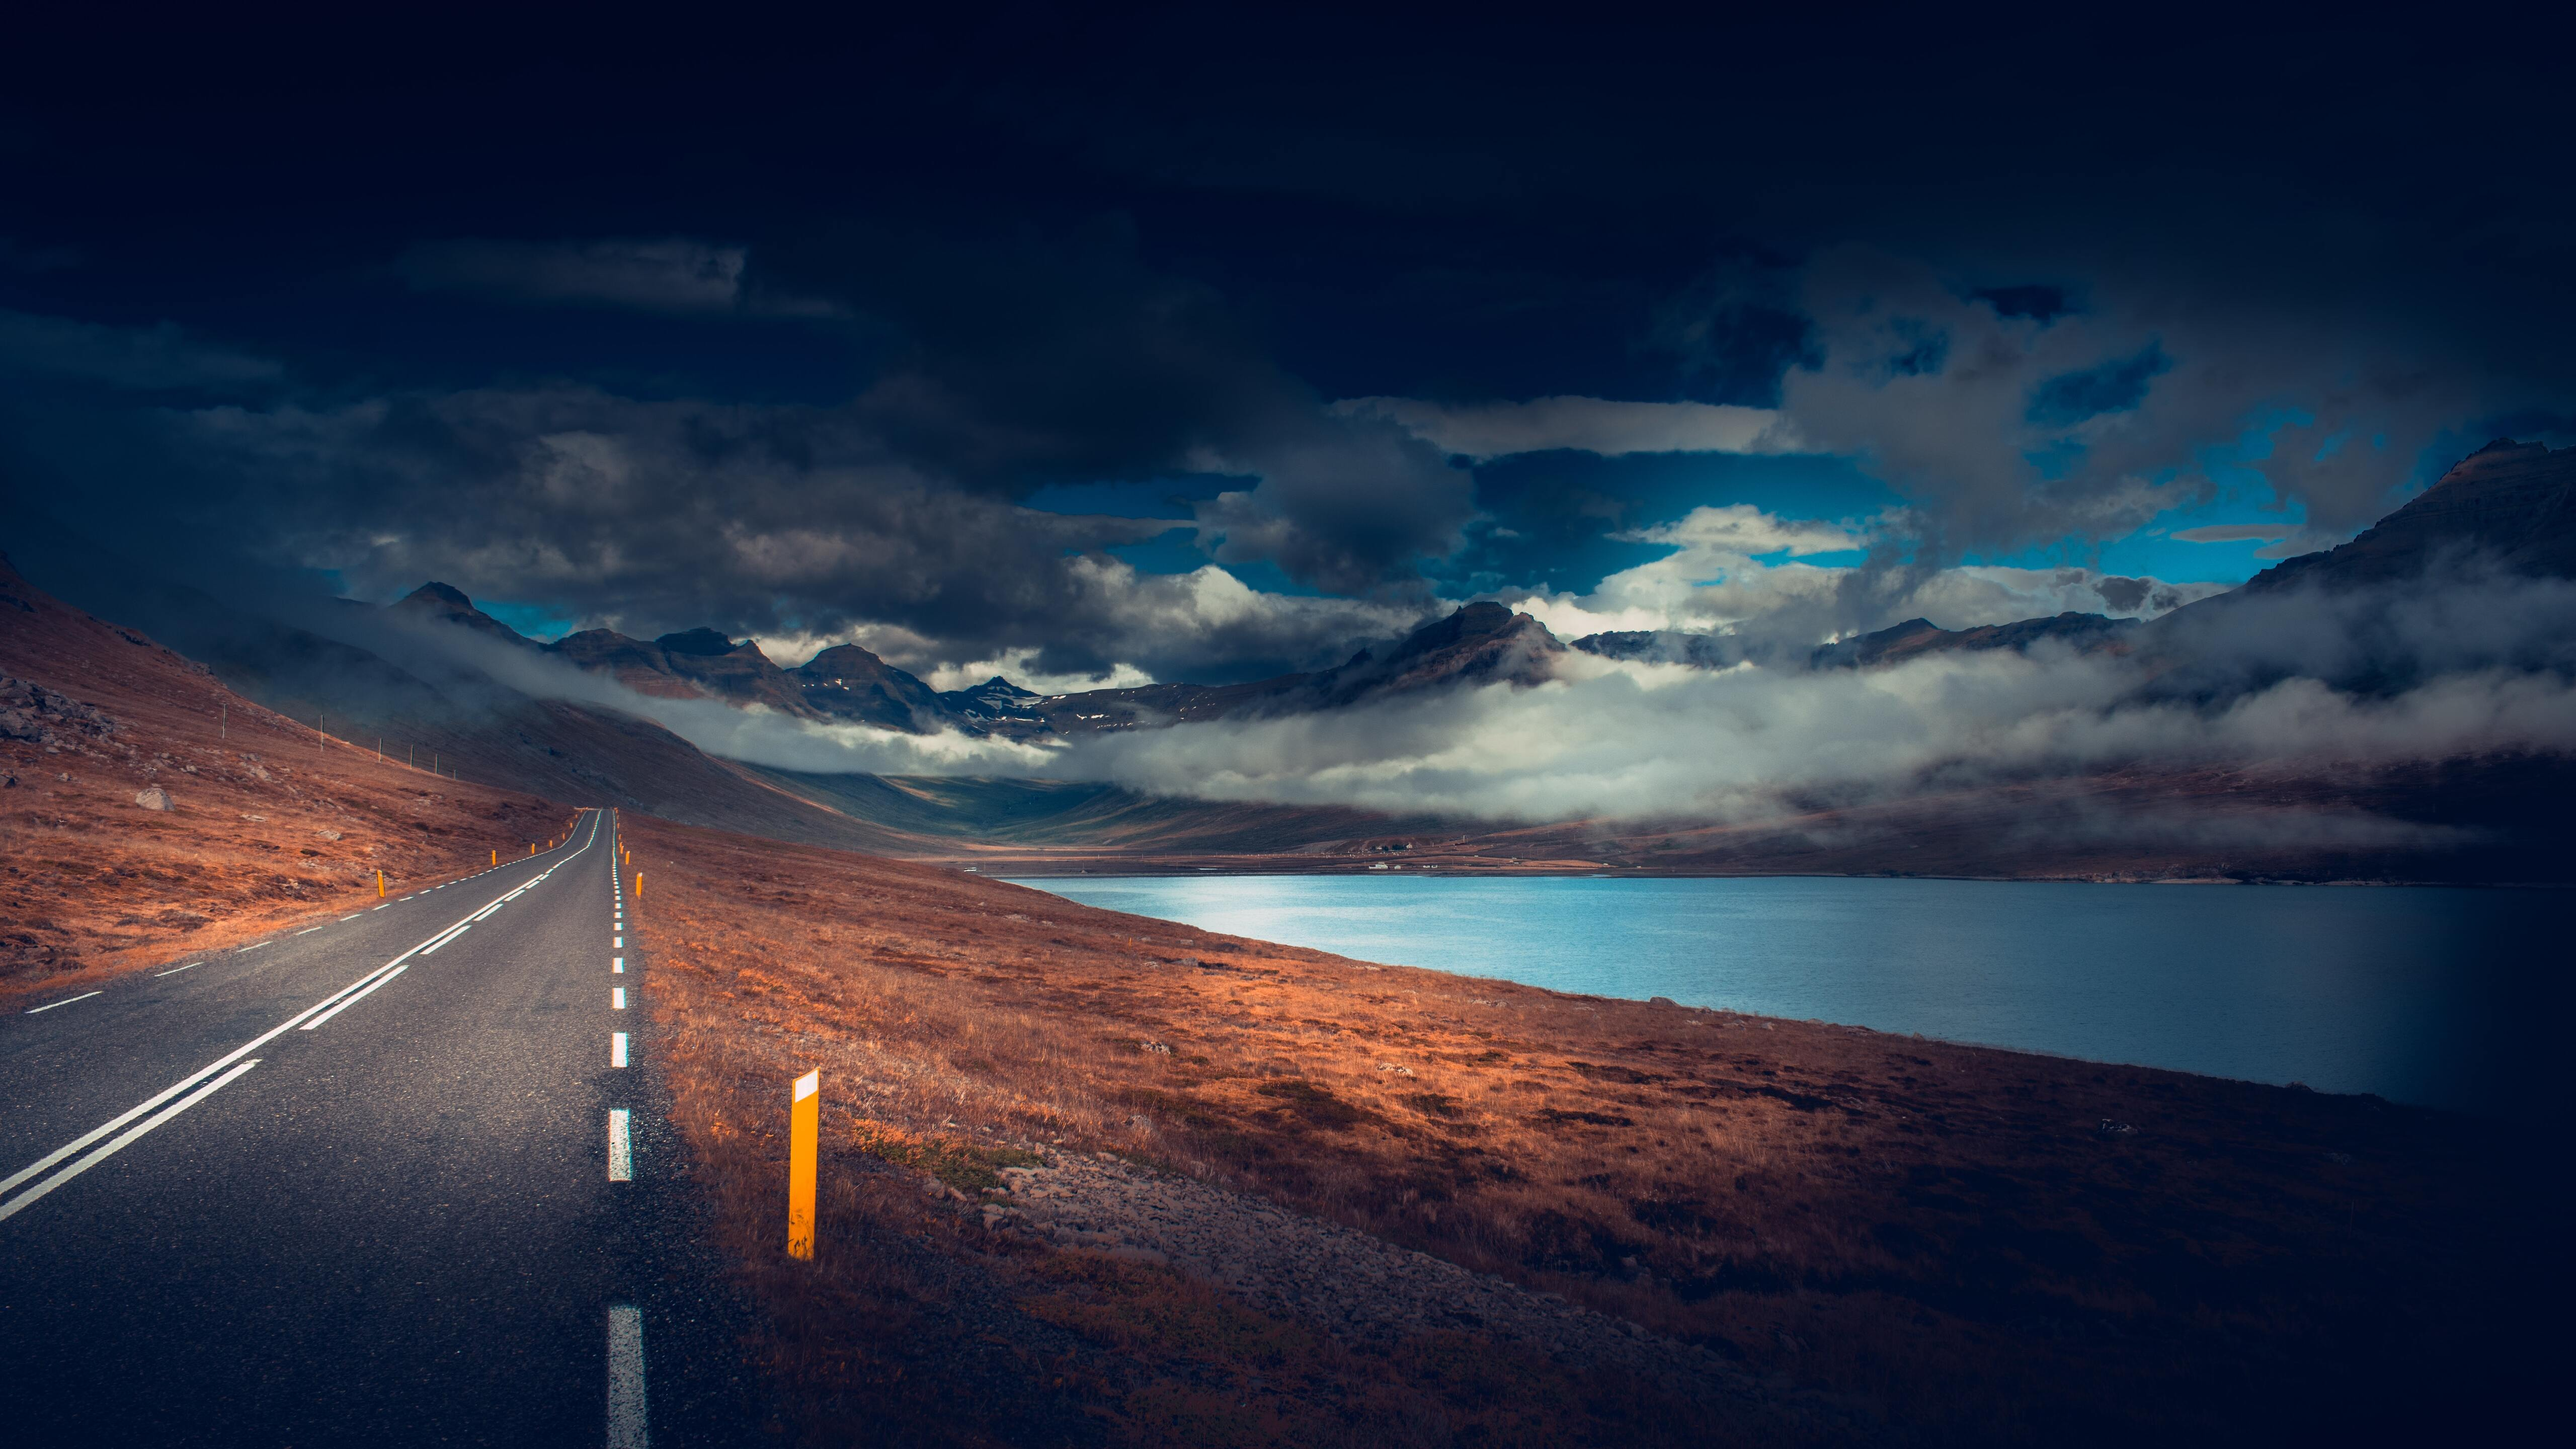 mountains-road-asphalt-5k-x0.jpg